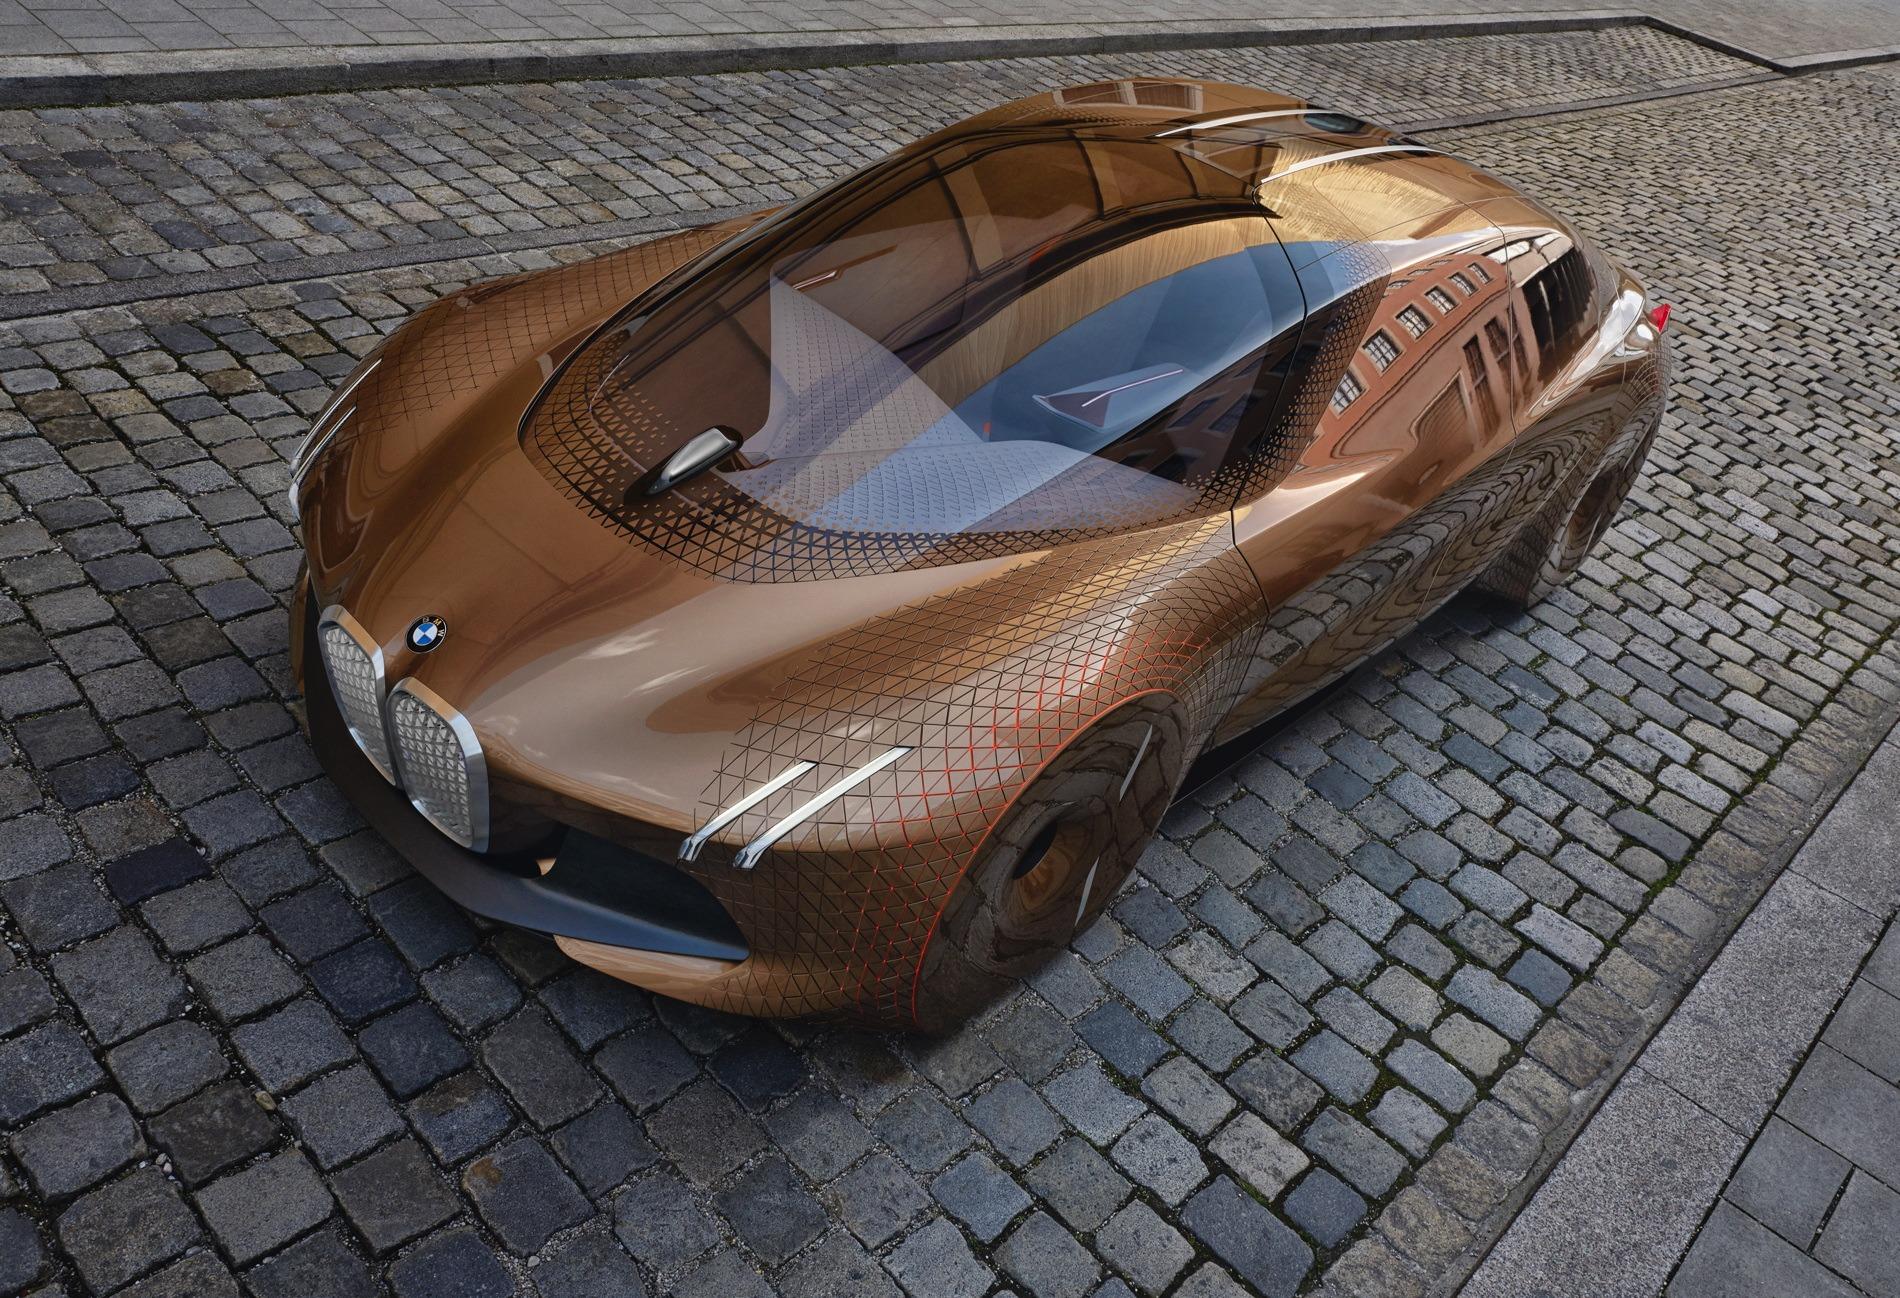 BMW zauzima oprezan strateški pristup